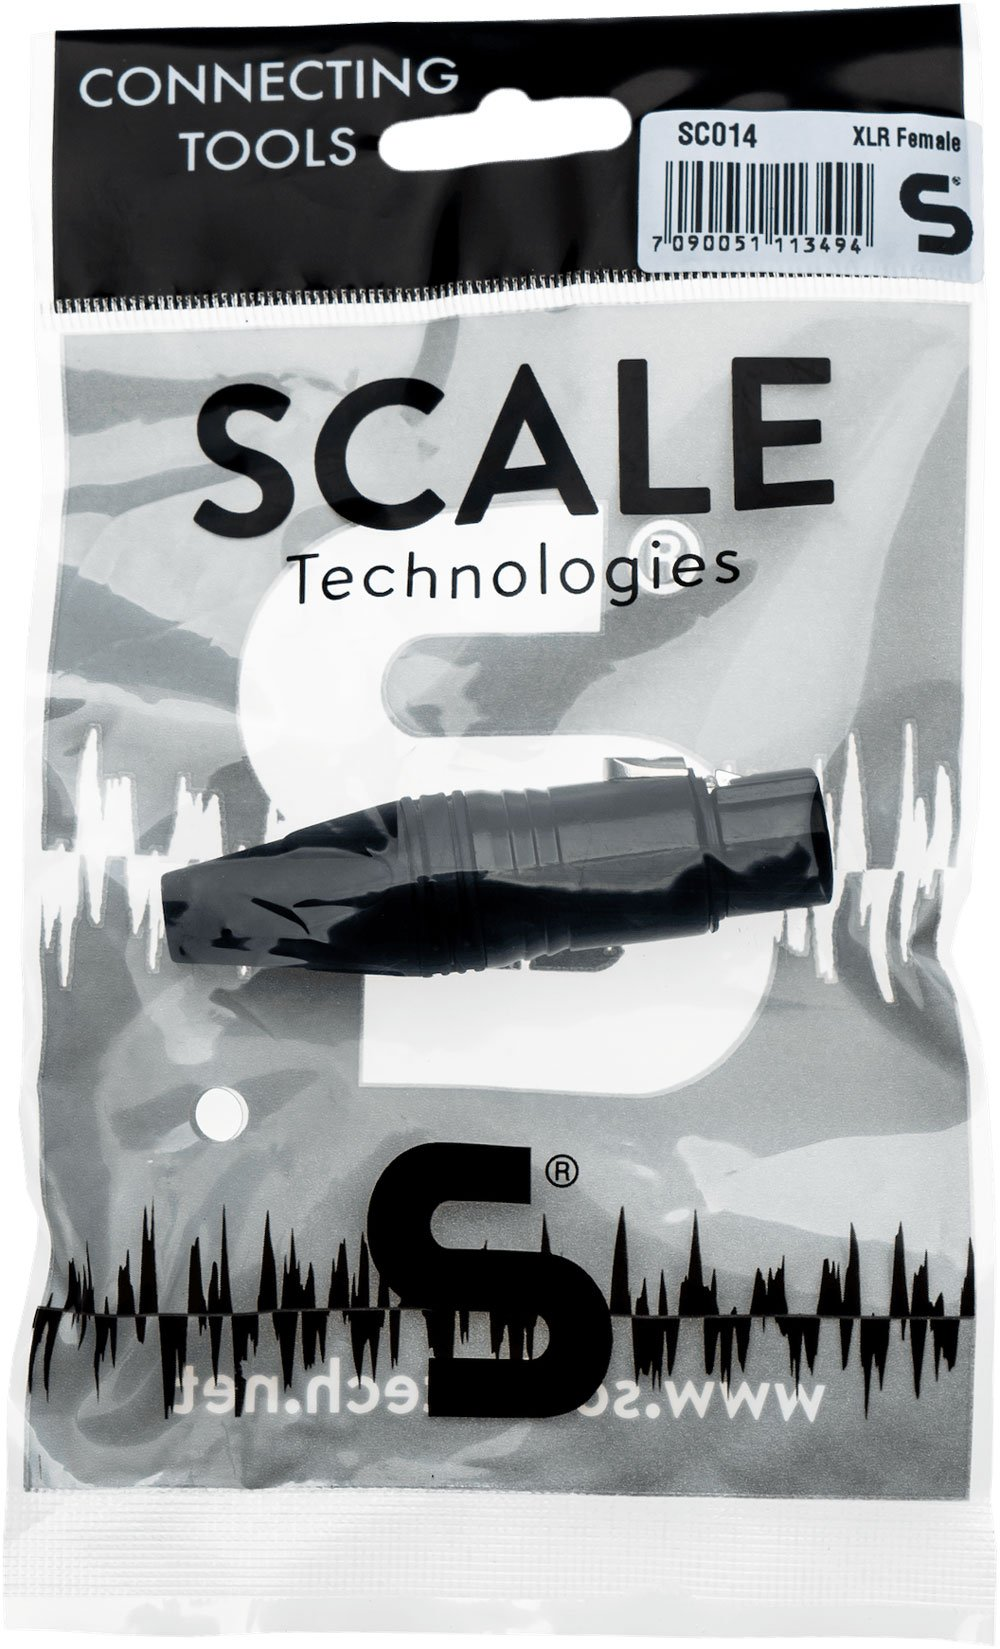 Scale Technologies SC014 - XLR female connector